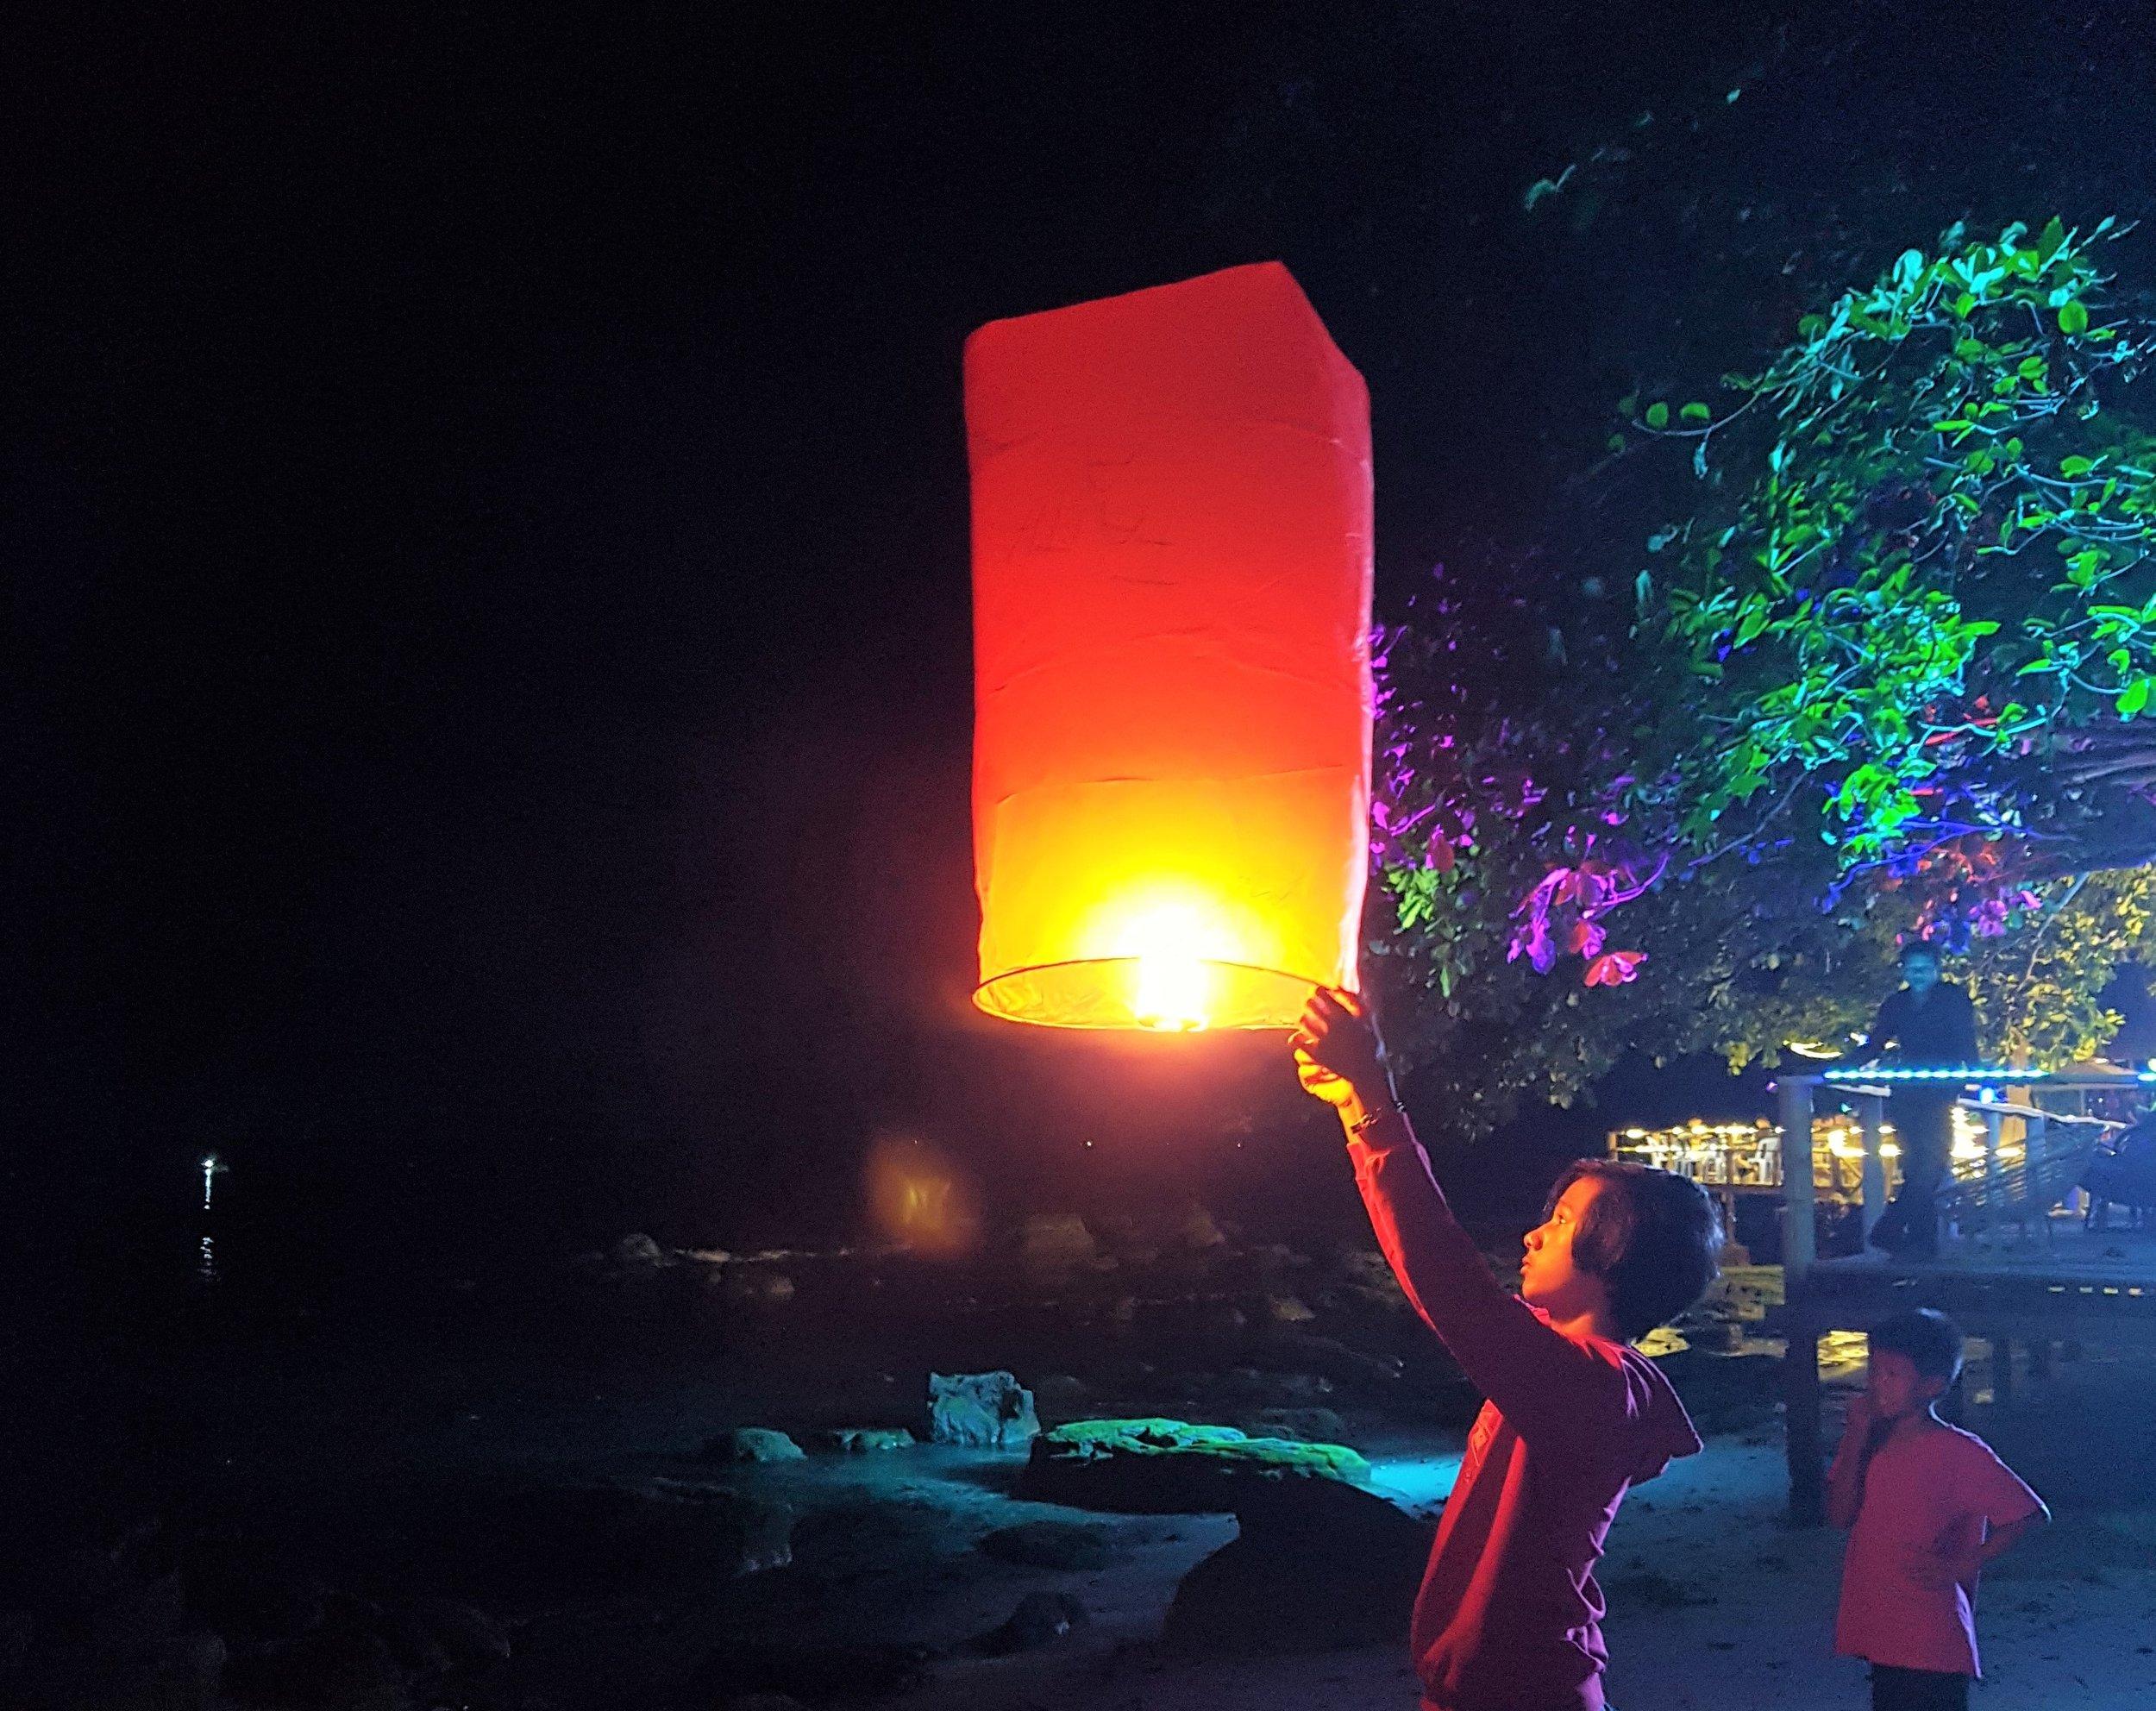 Local boy launching a Chinese flying lantern